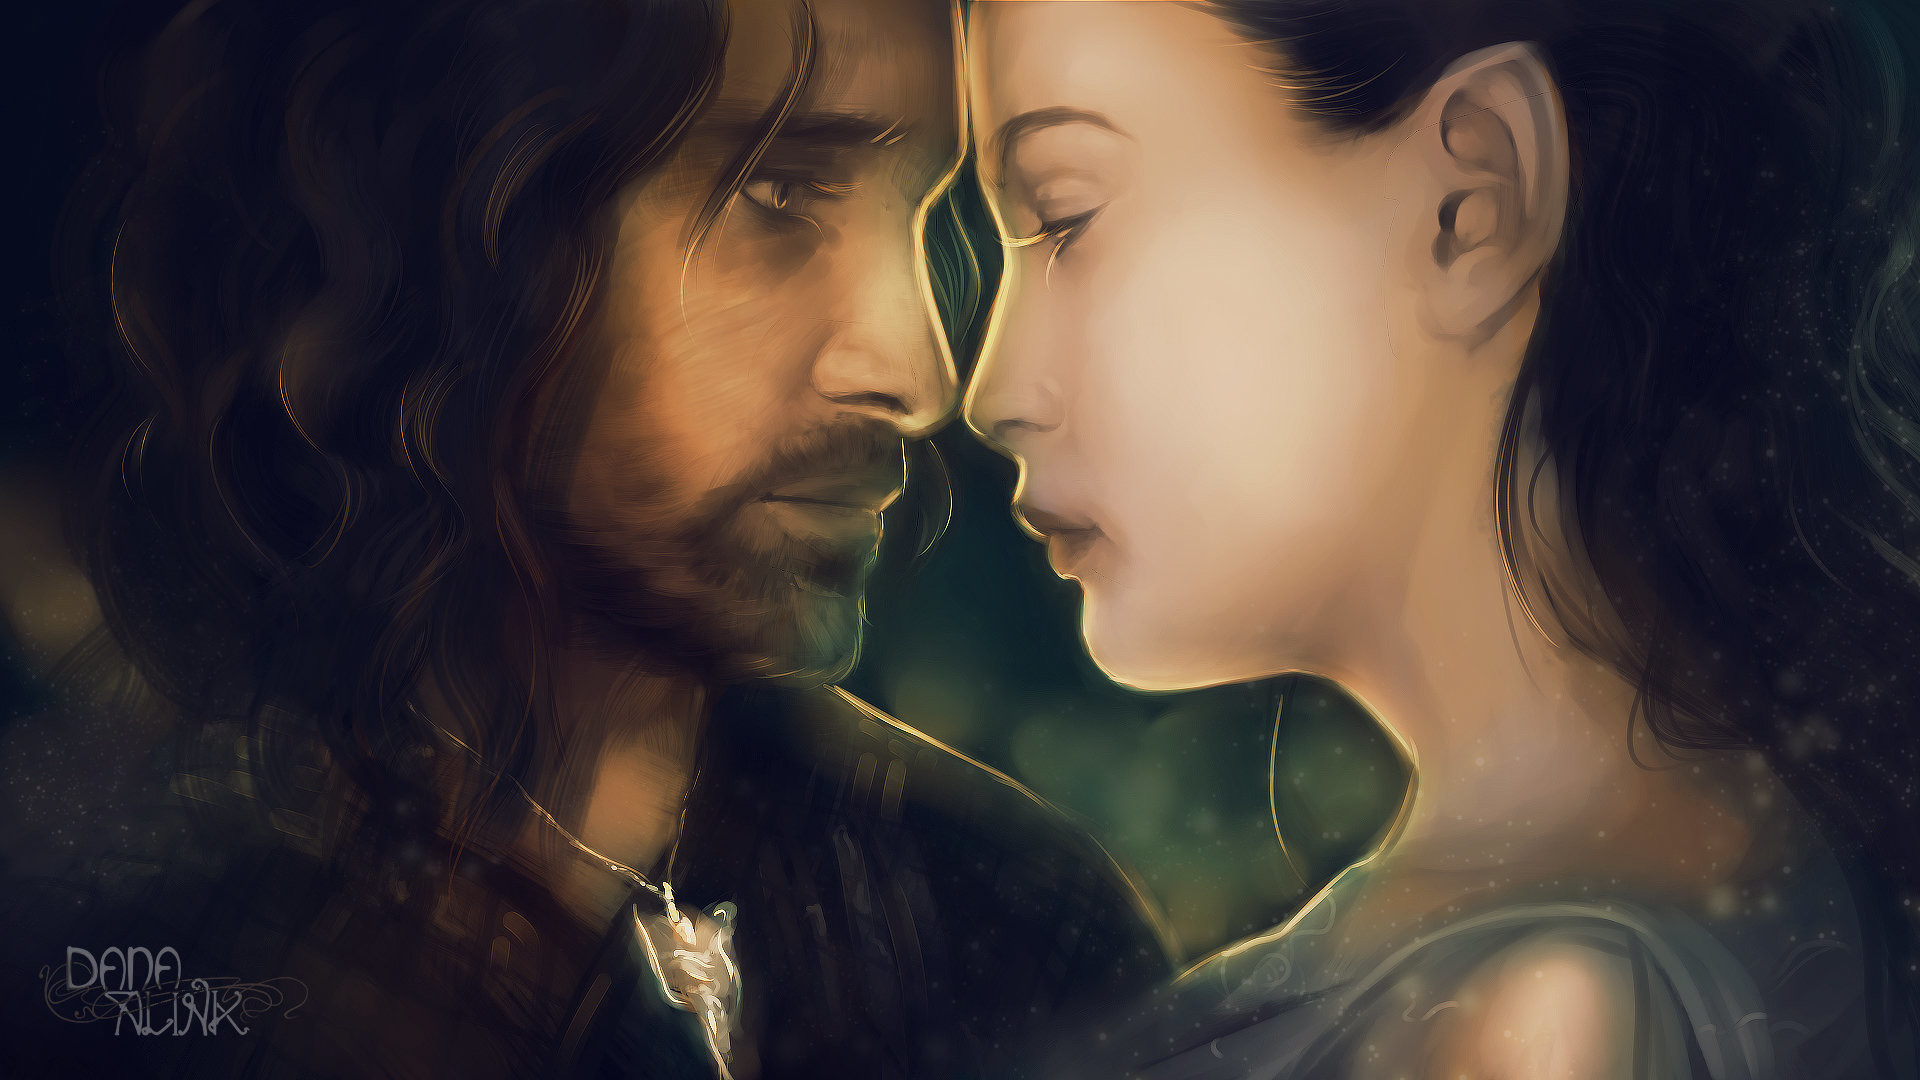 Res: 1920x1080, Fan-art Friday: Aragorn and Arwen